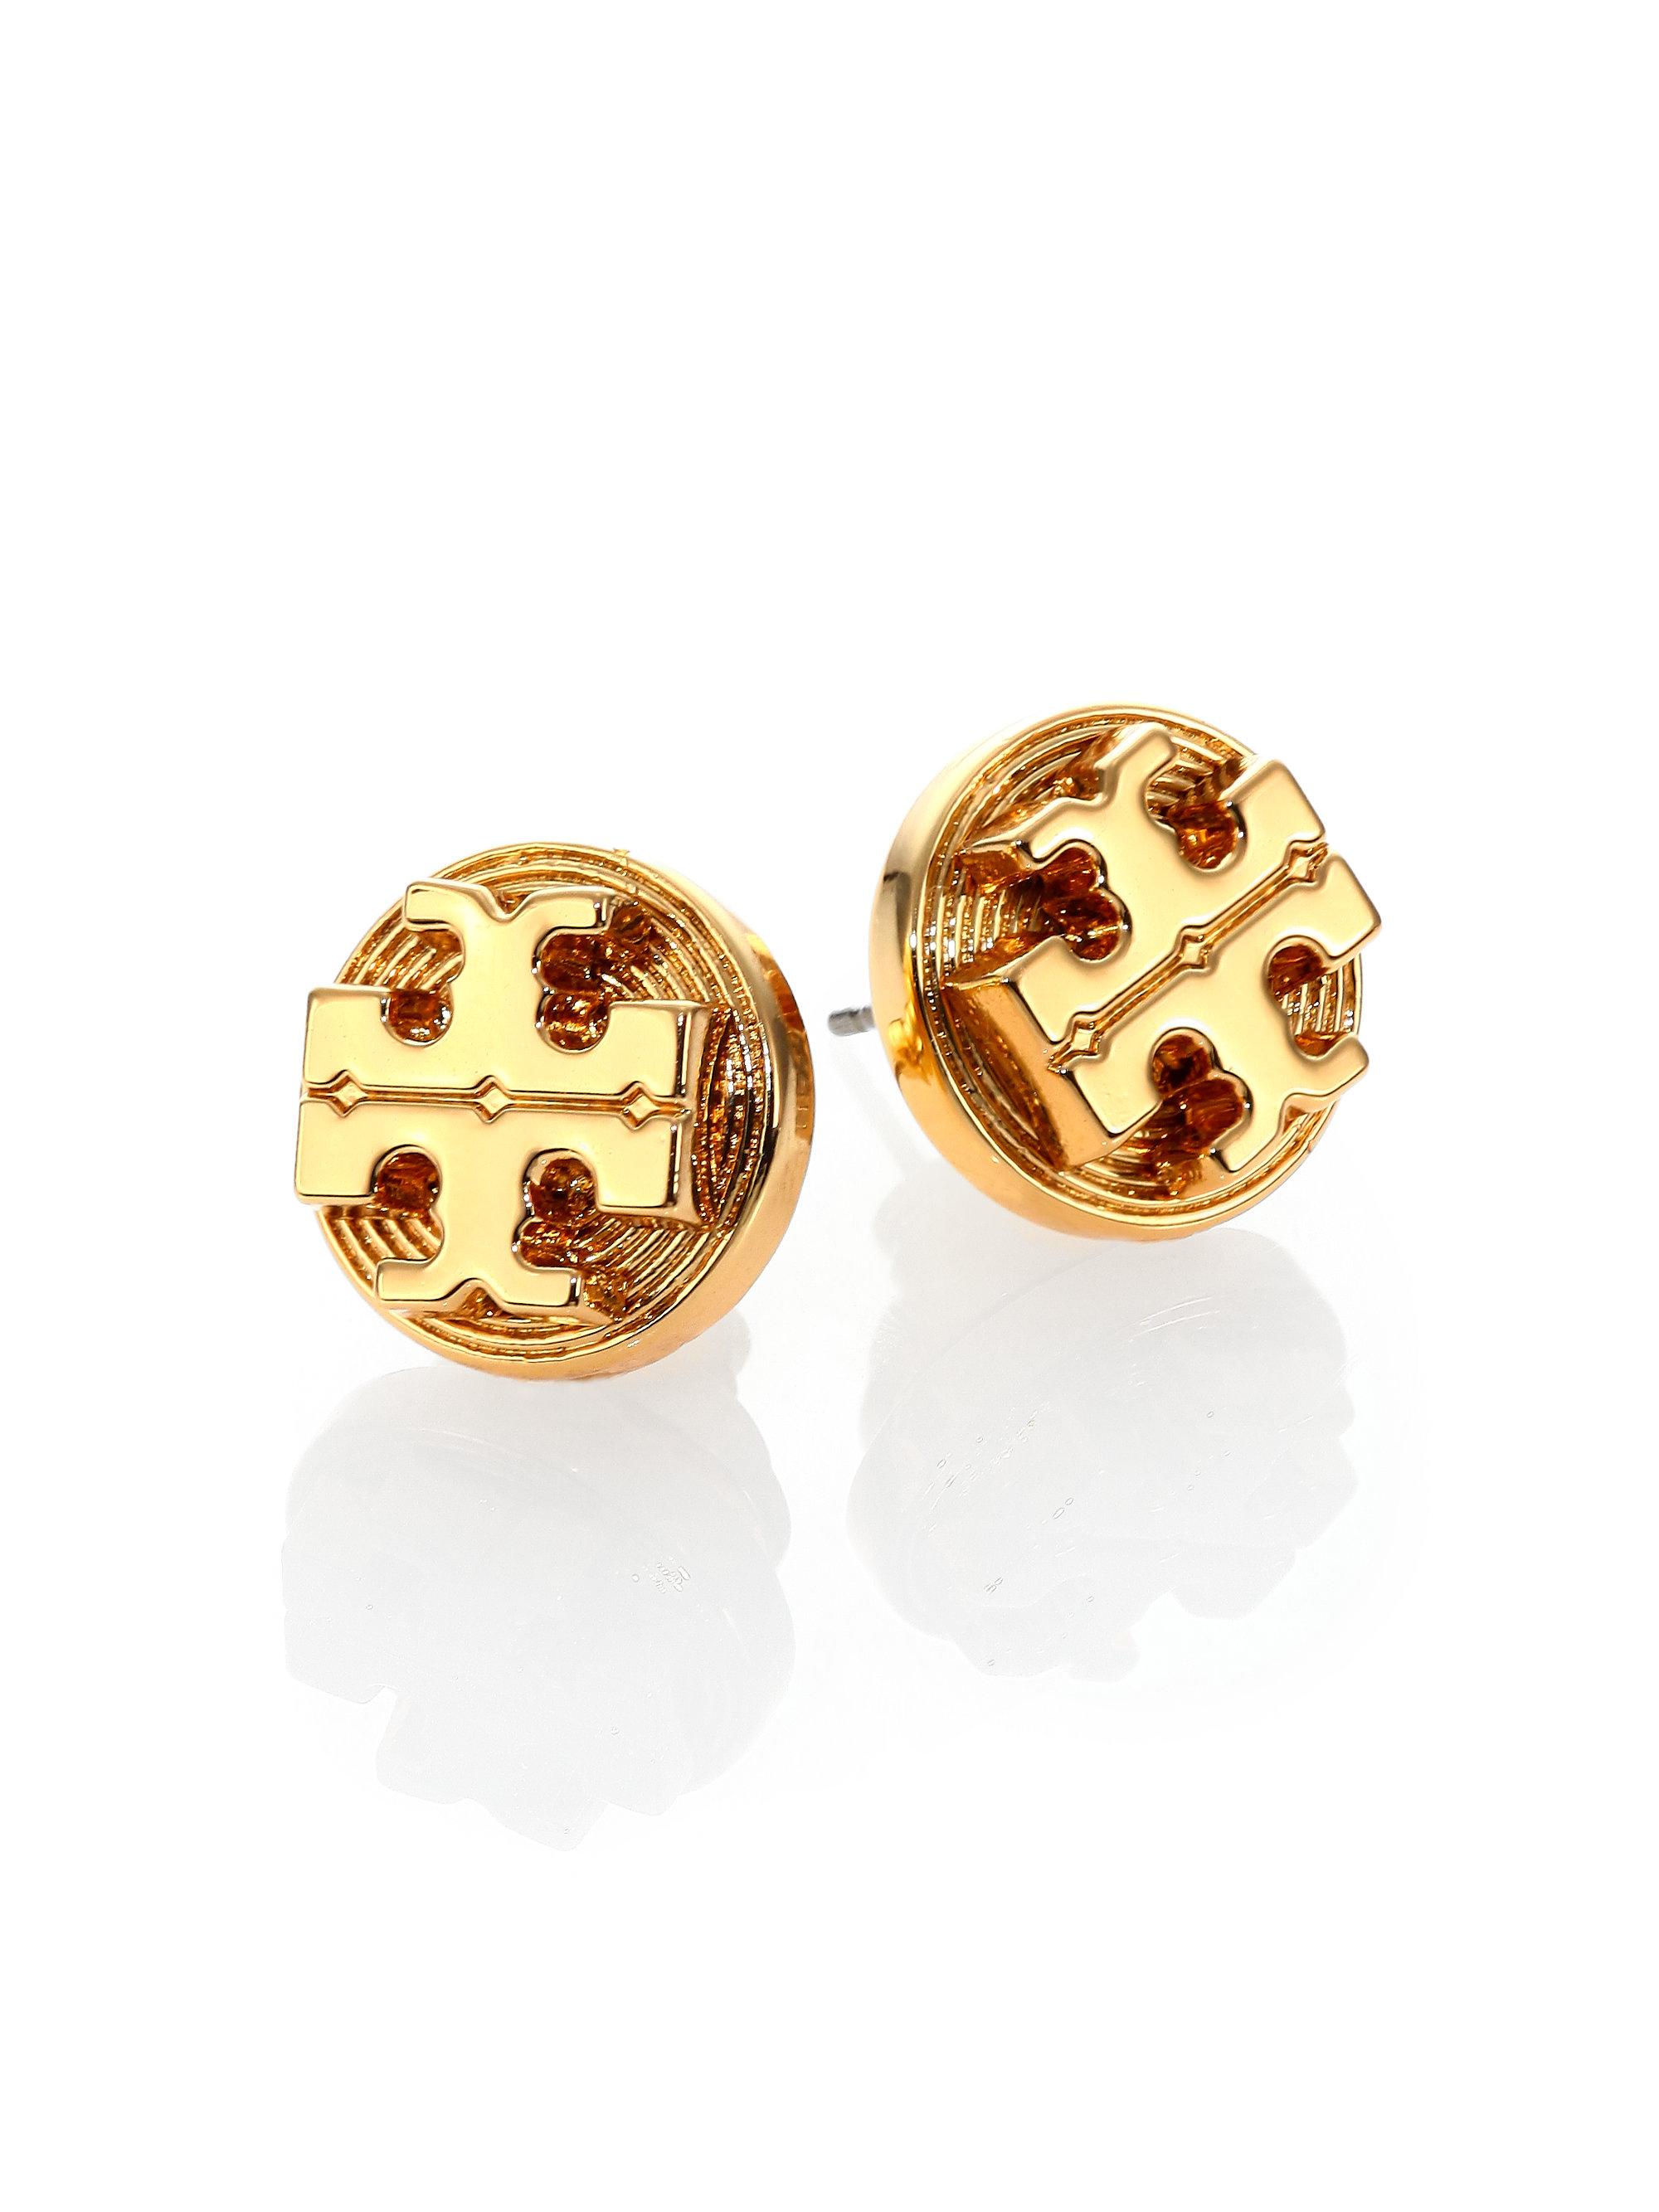 aa49ab0f6 Tory Burch Livia Logo Stud Earrings in Metallic - Lyst